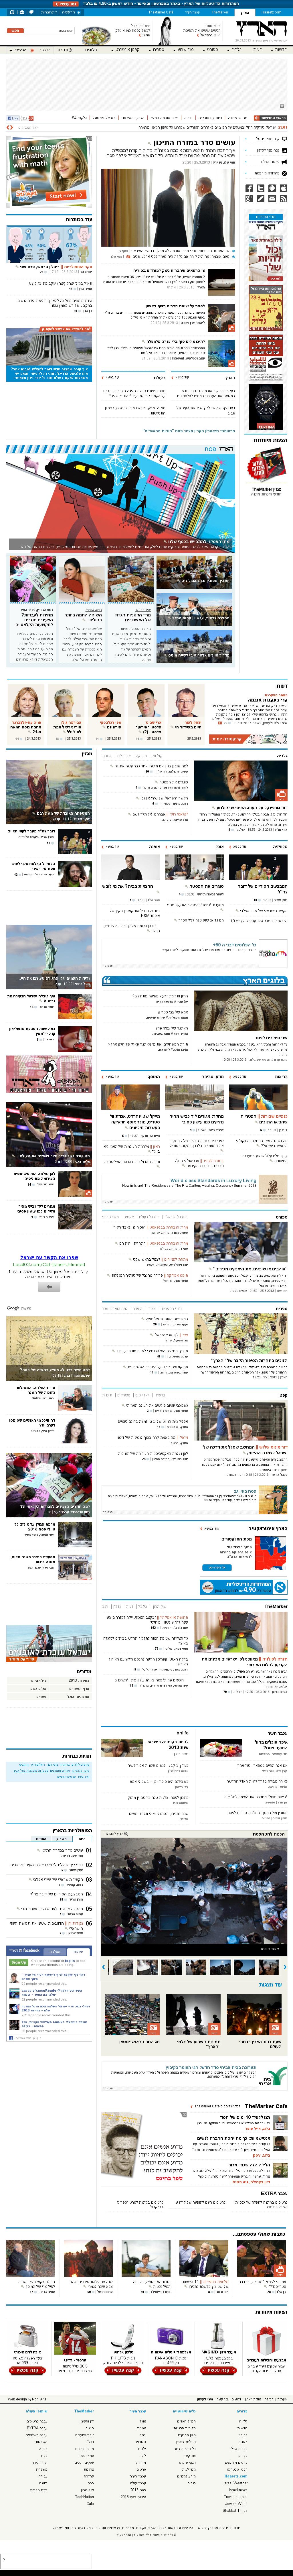 Haaretz at Tuesday March 26, 2013, 12:18 a.m. UTC